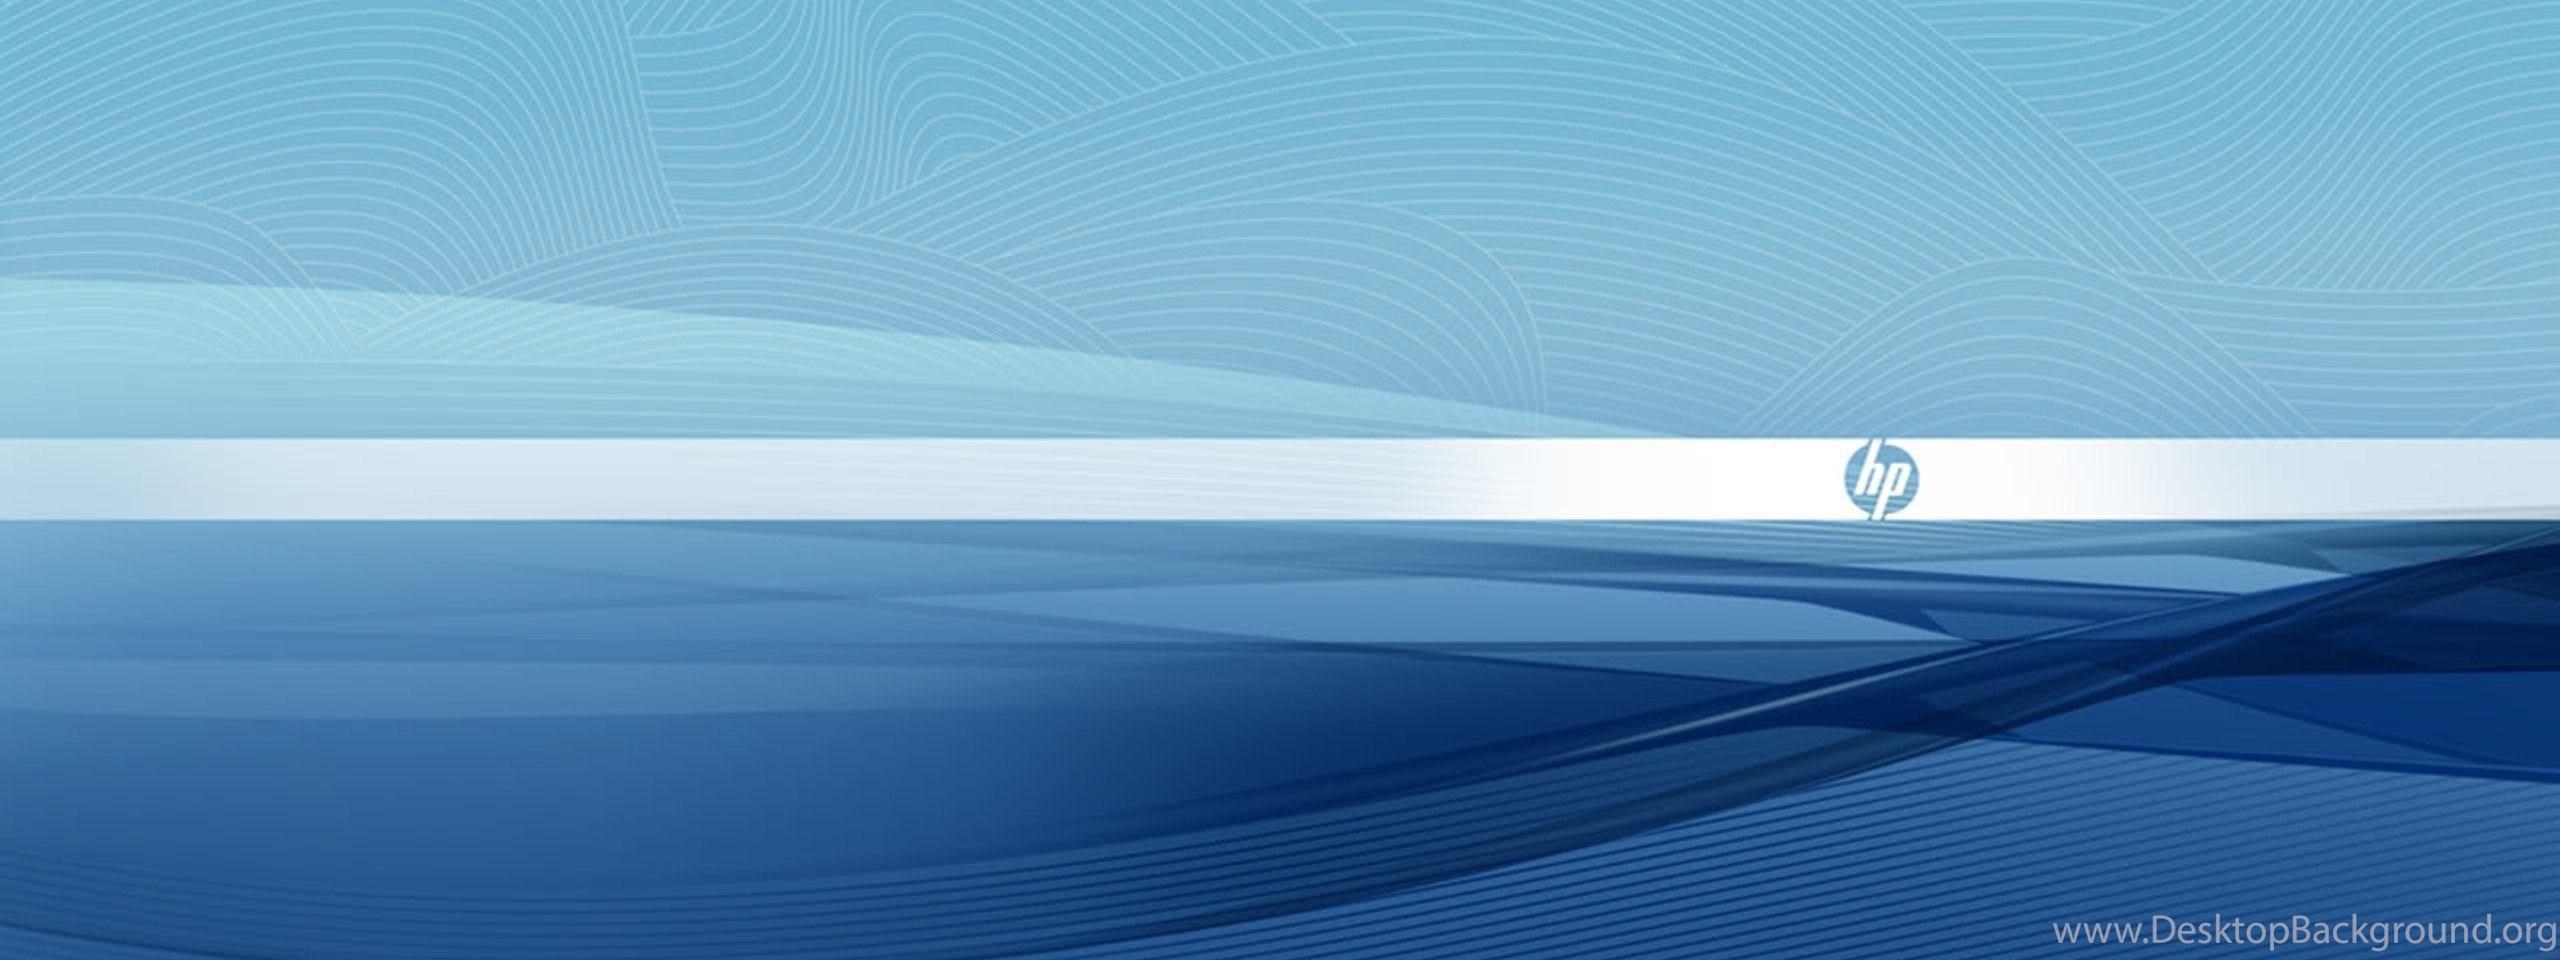 Hp Blue Wallpapers Desktop Background